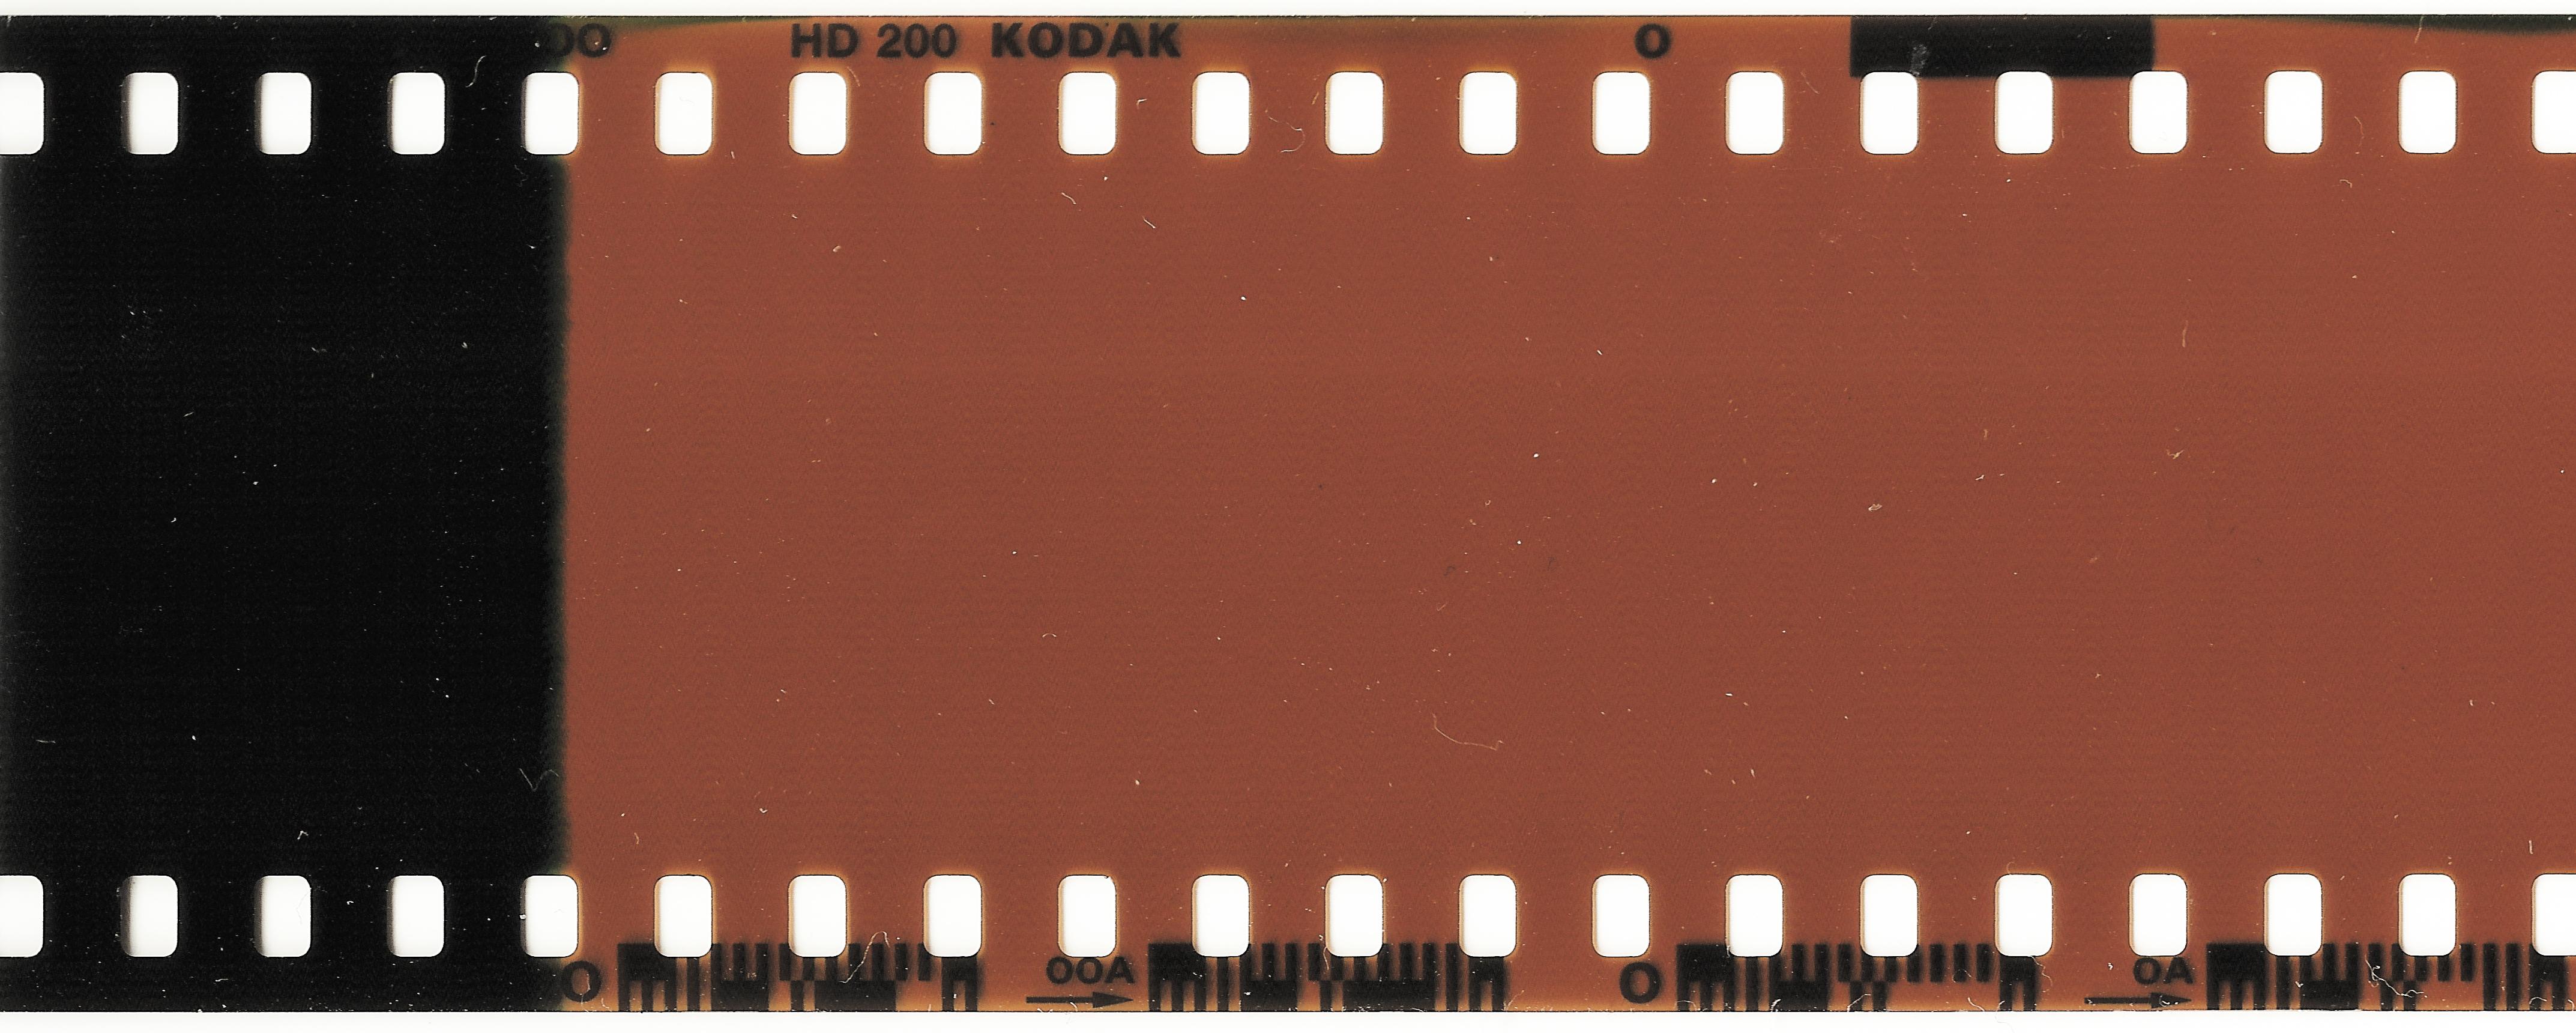 35mm Film 4291x1720